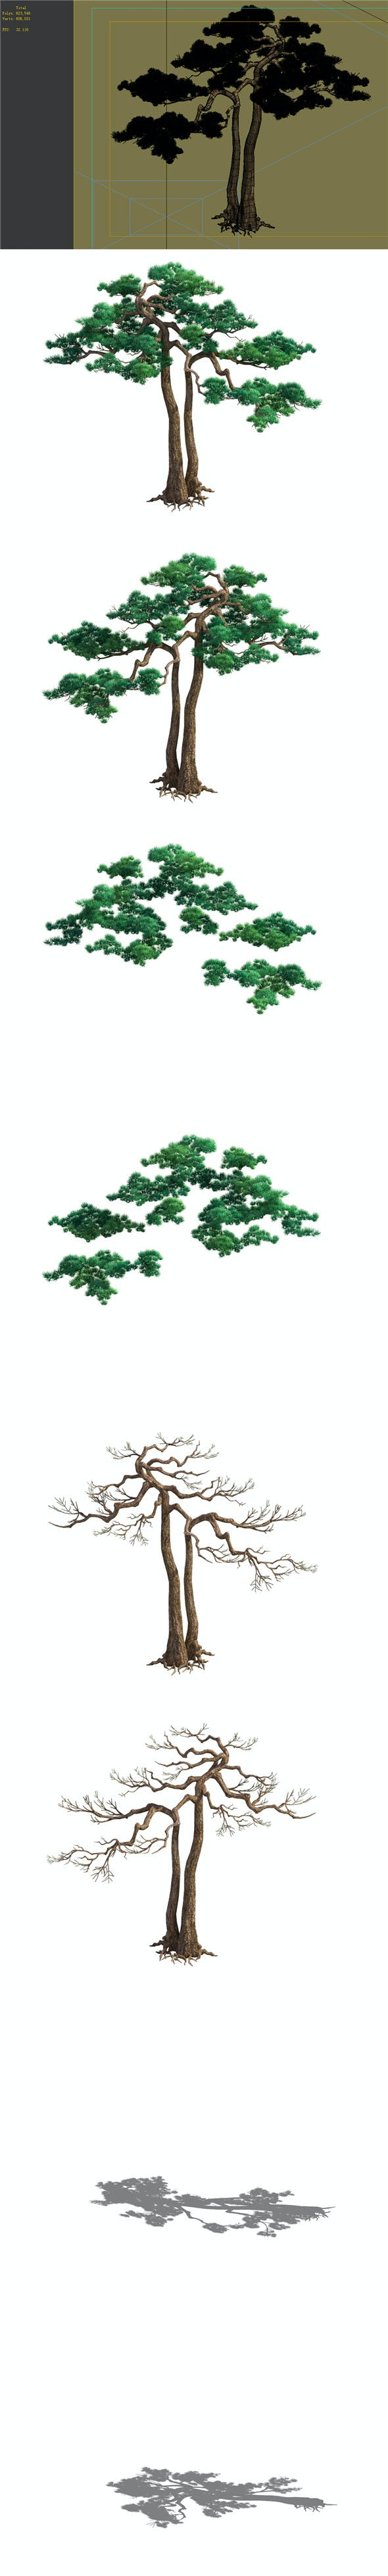 Game Model - Taoist comprehension scene - Pine 03 01 - 3DOcean Item for Sale